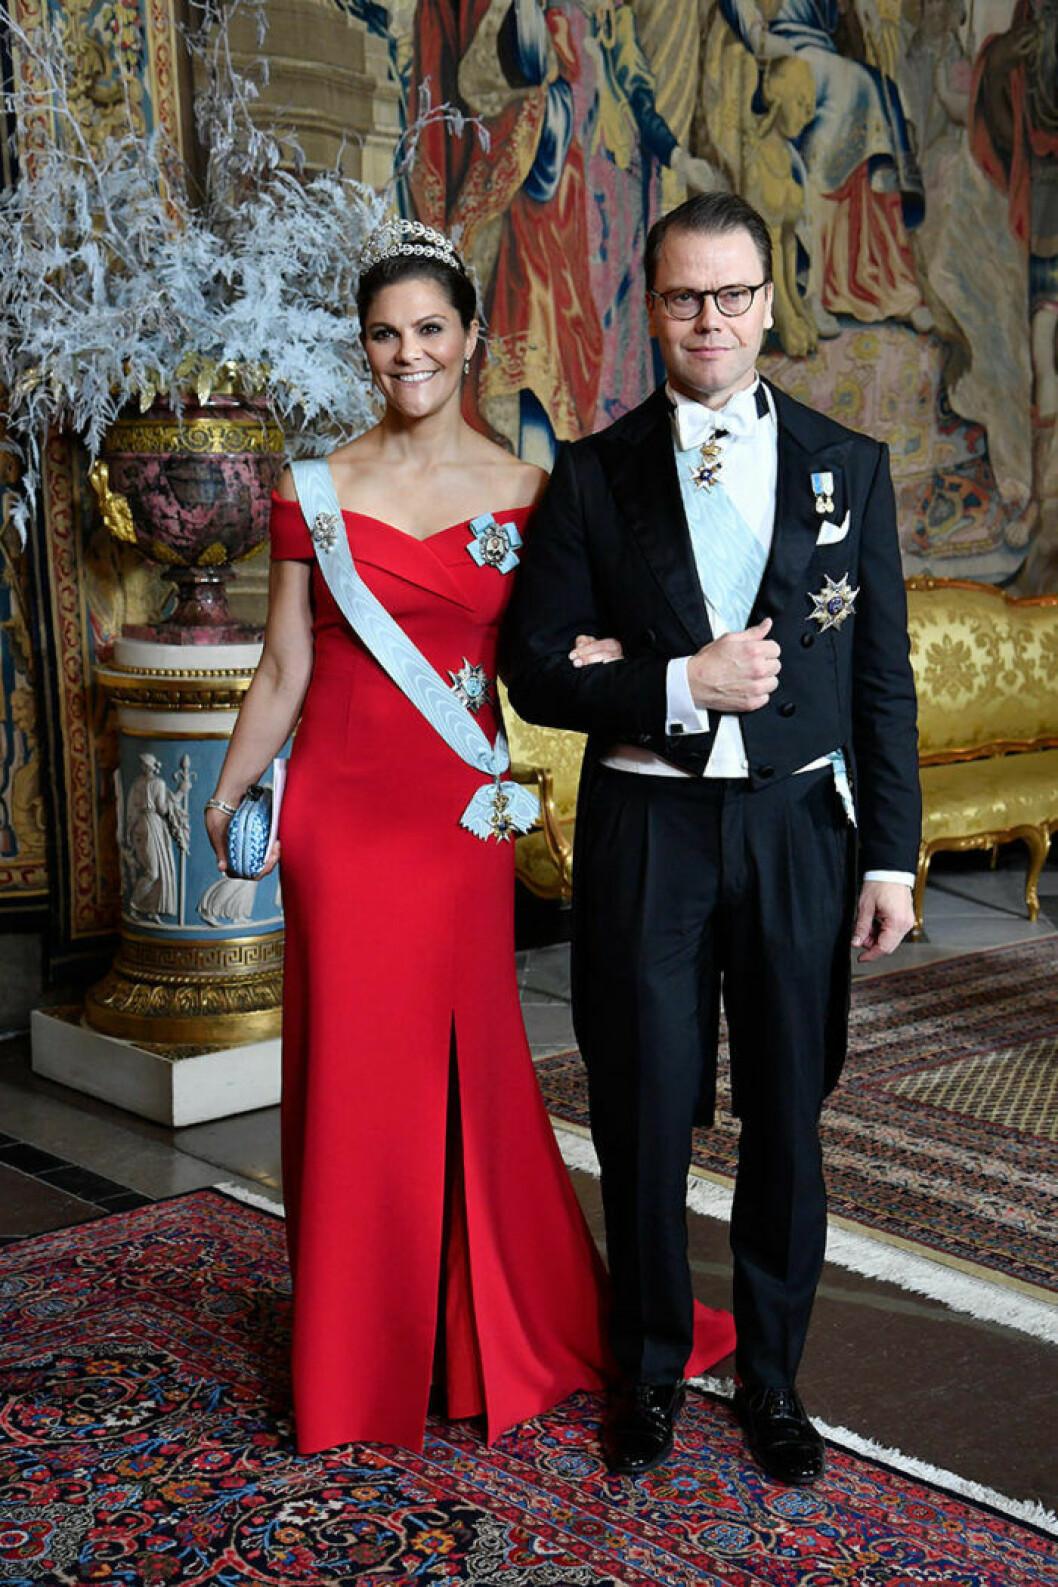 kronprinsessan victoria nobel middag slottet